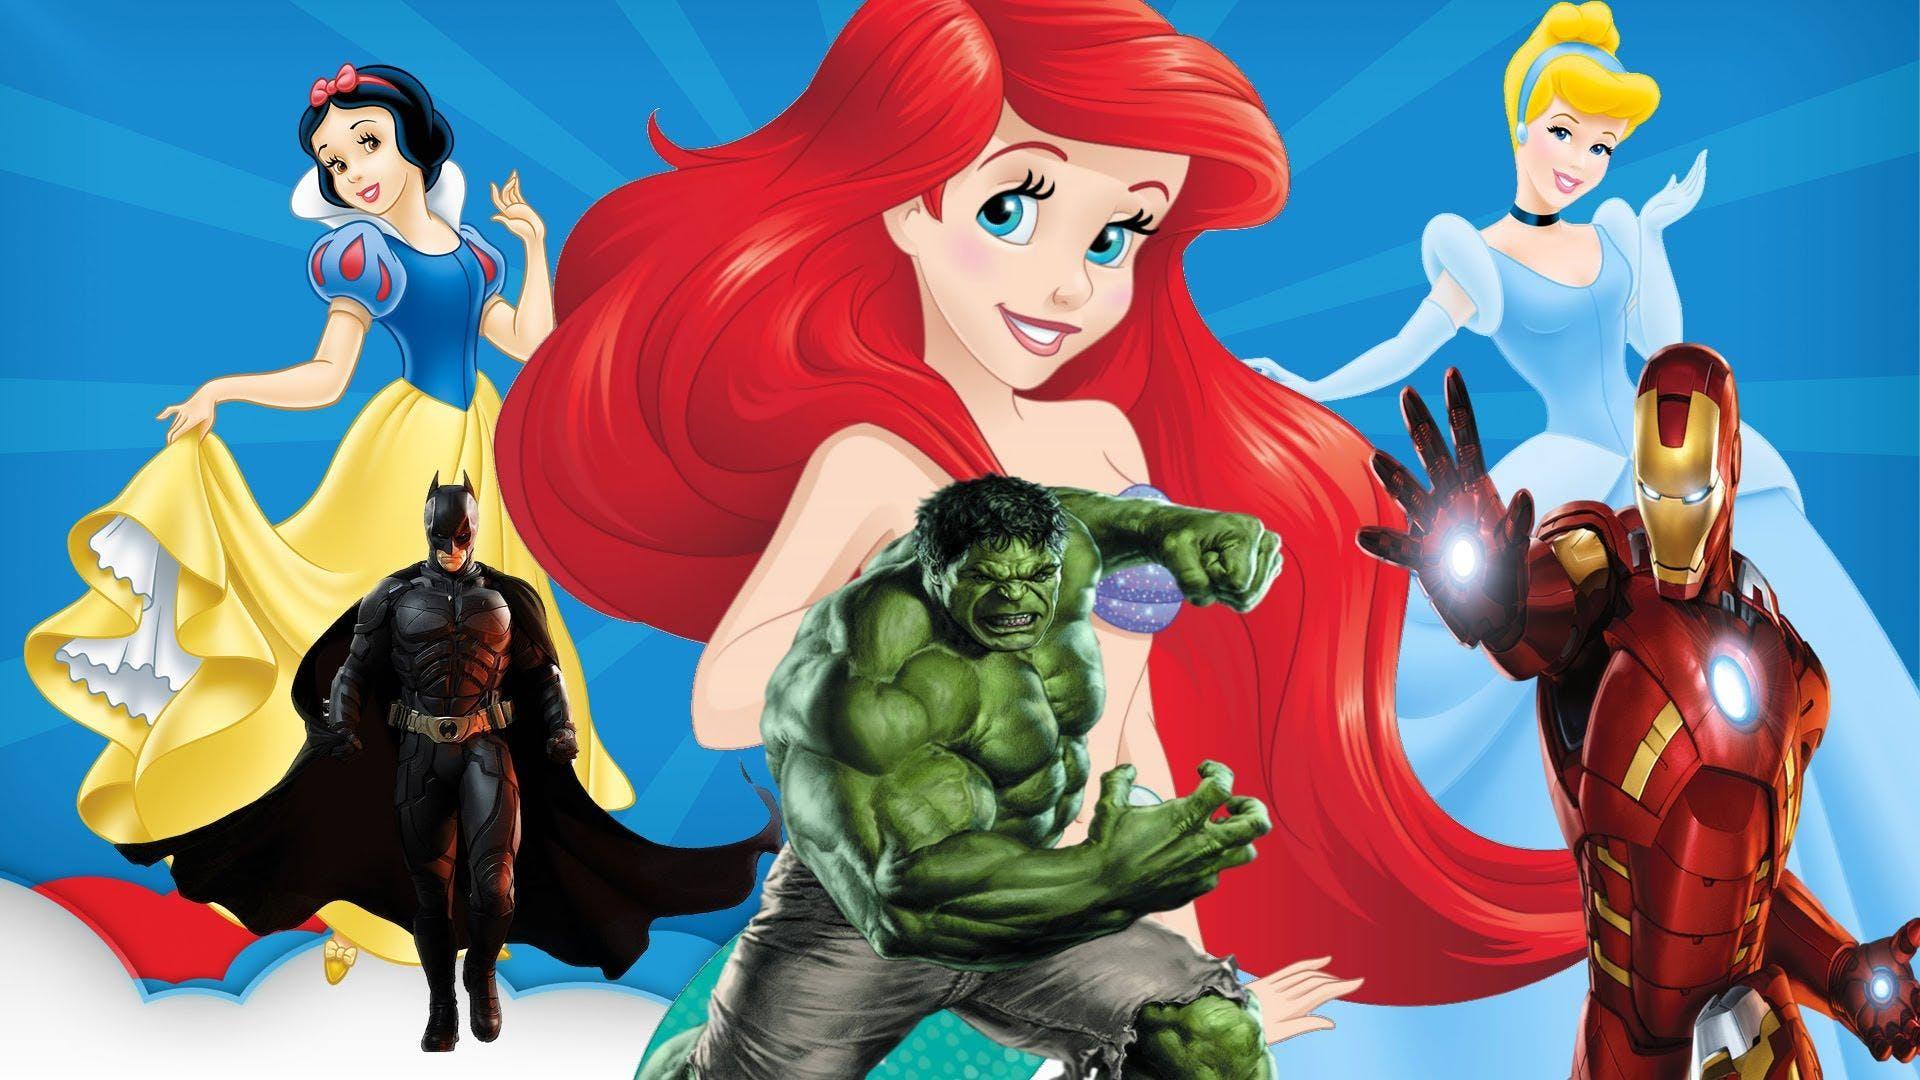 Superheroes & Princesses - Primary 4 -Primary